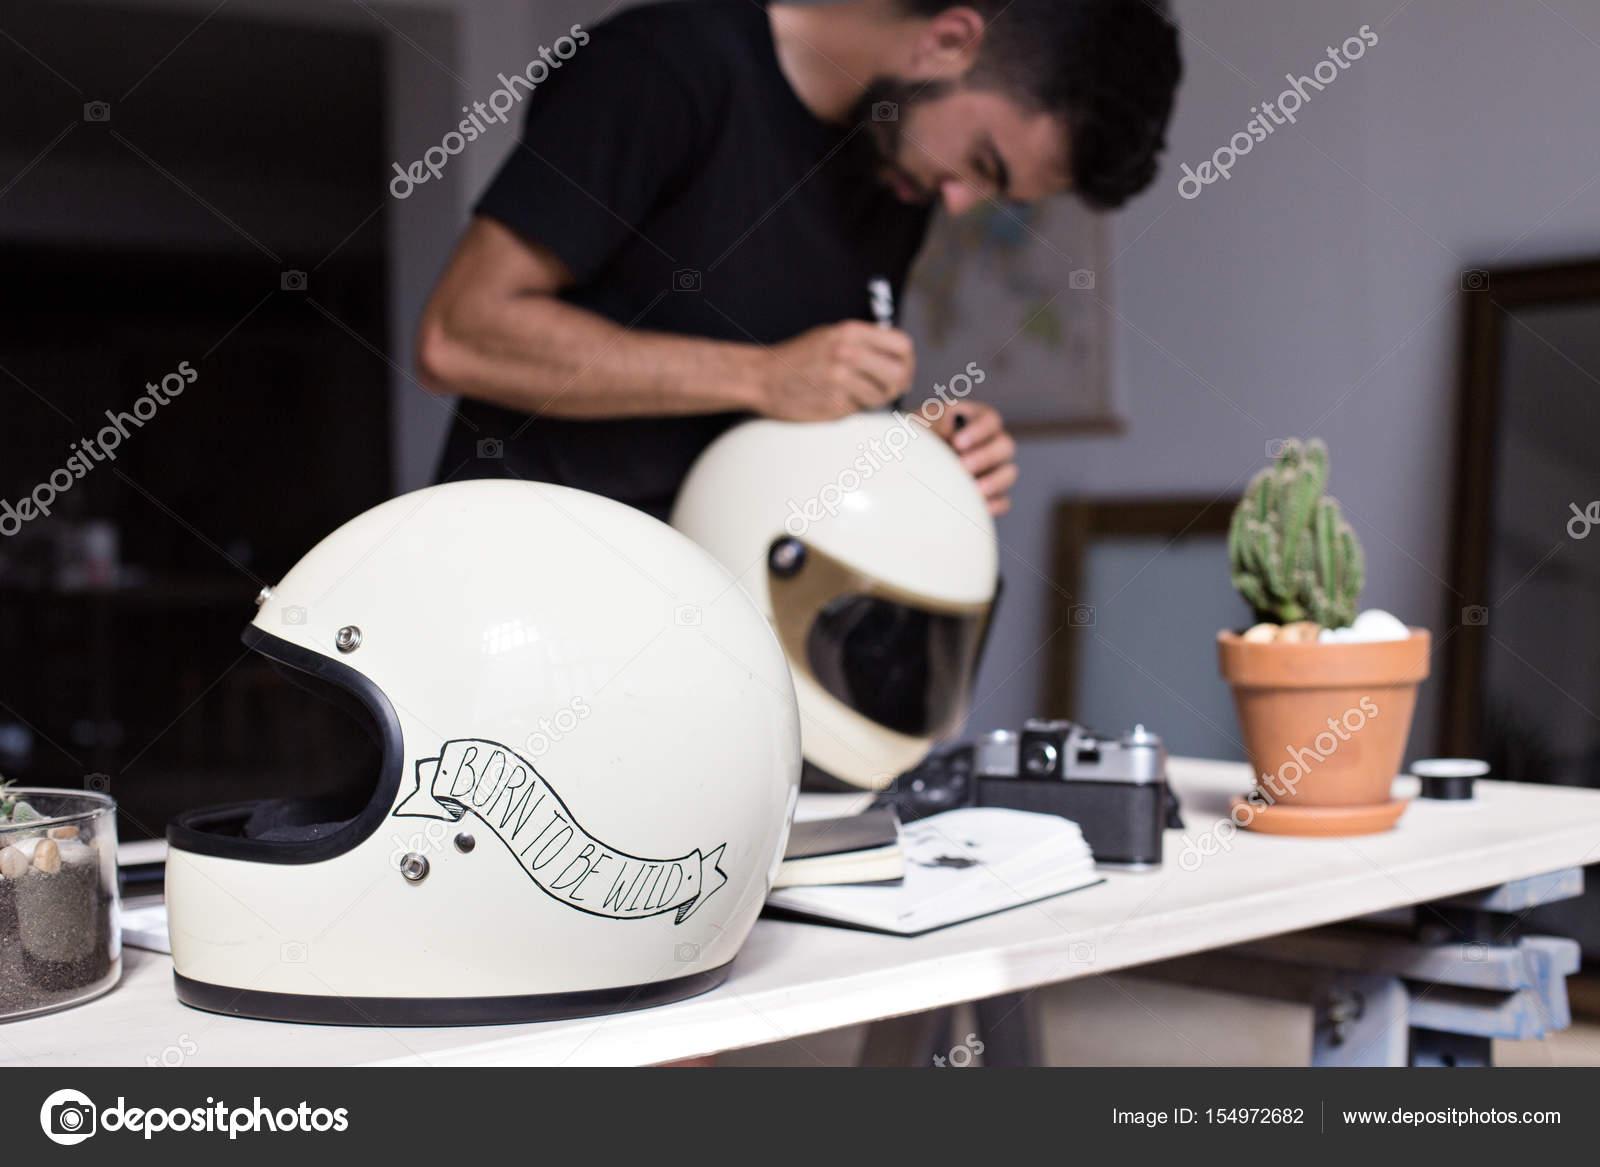 Personnaliser un casque moto